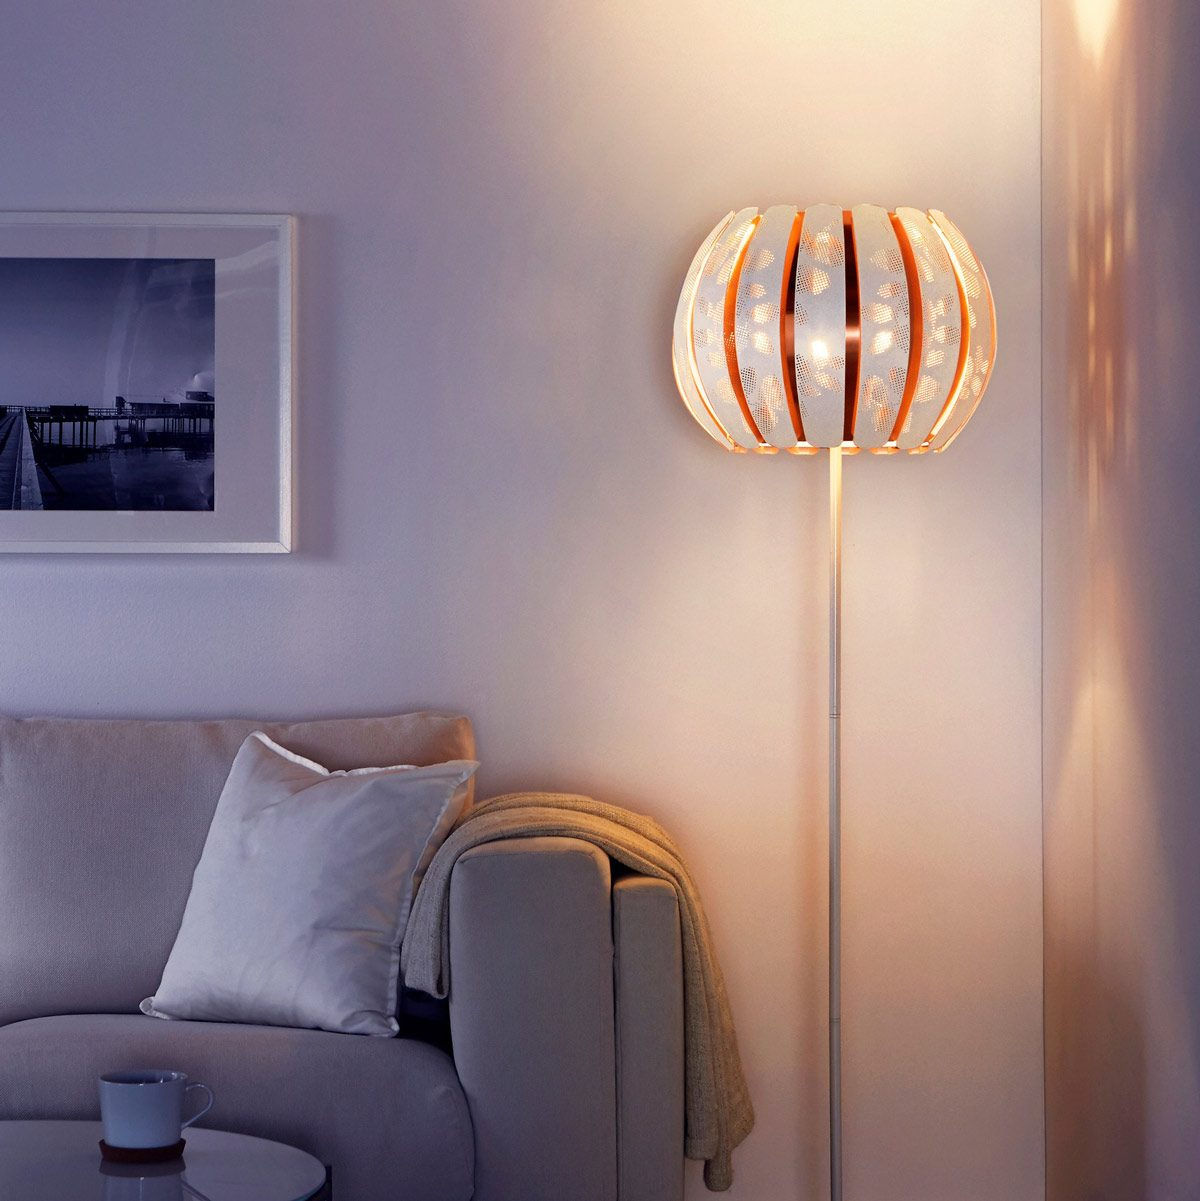 IKEA lamp shade